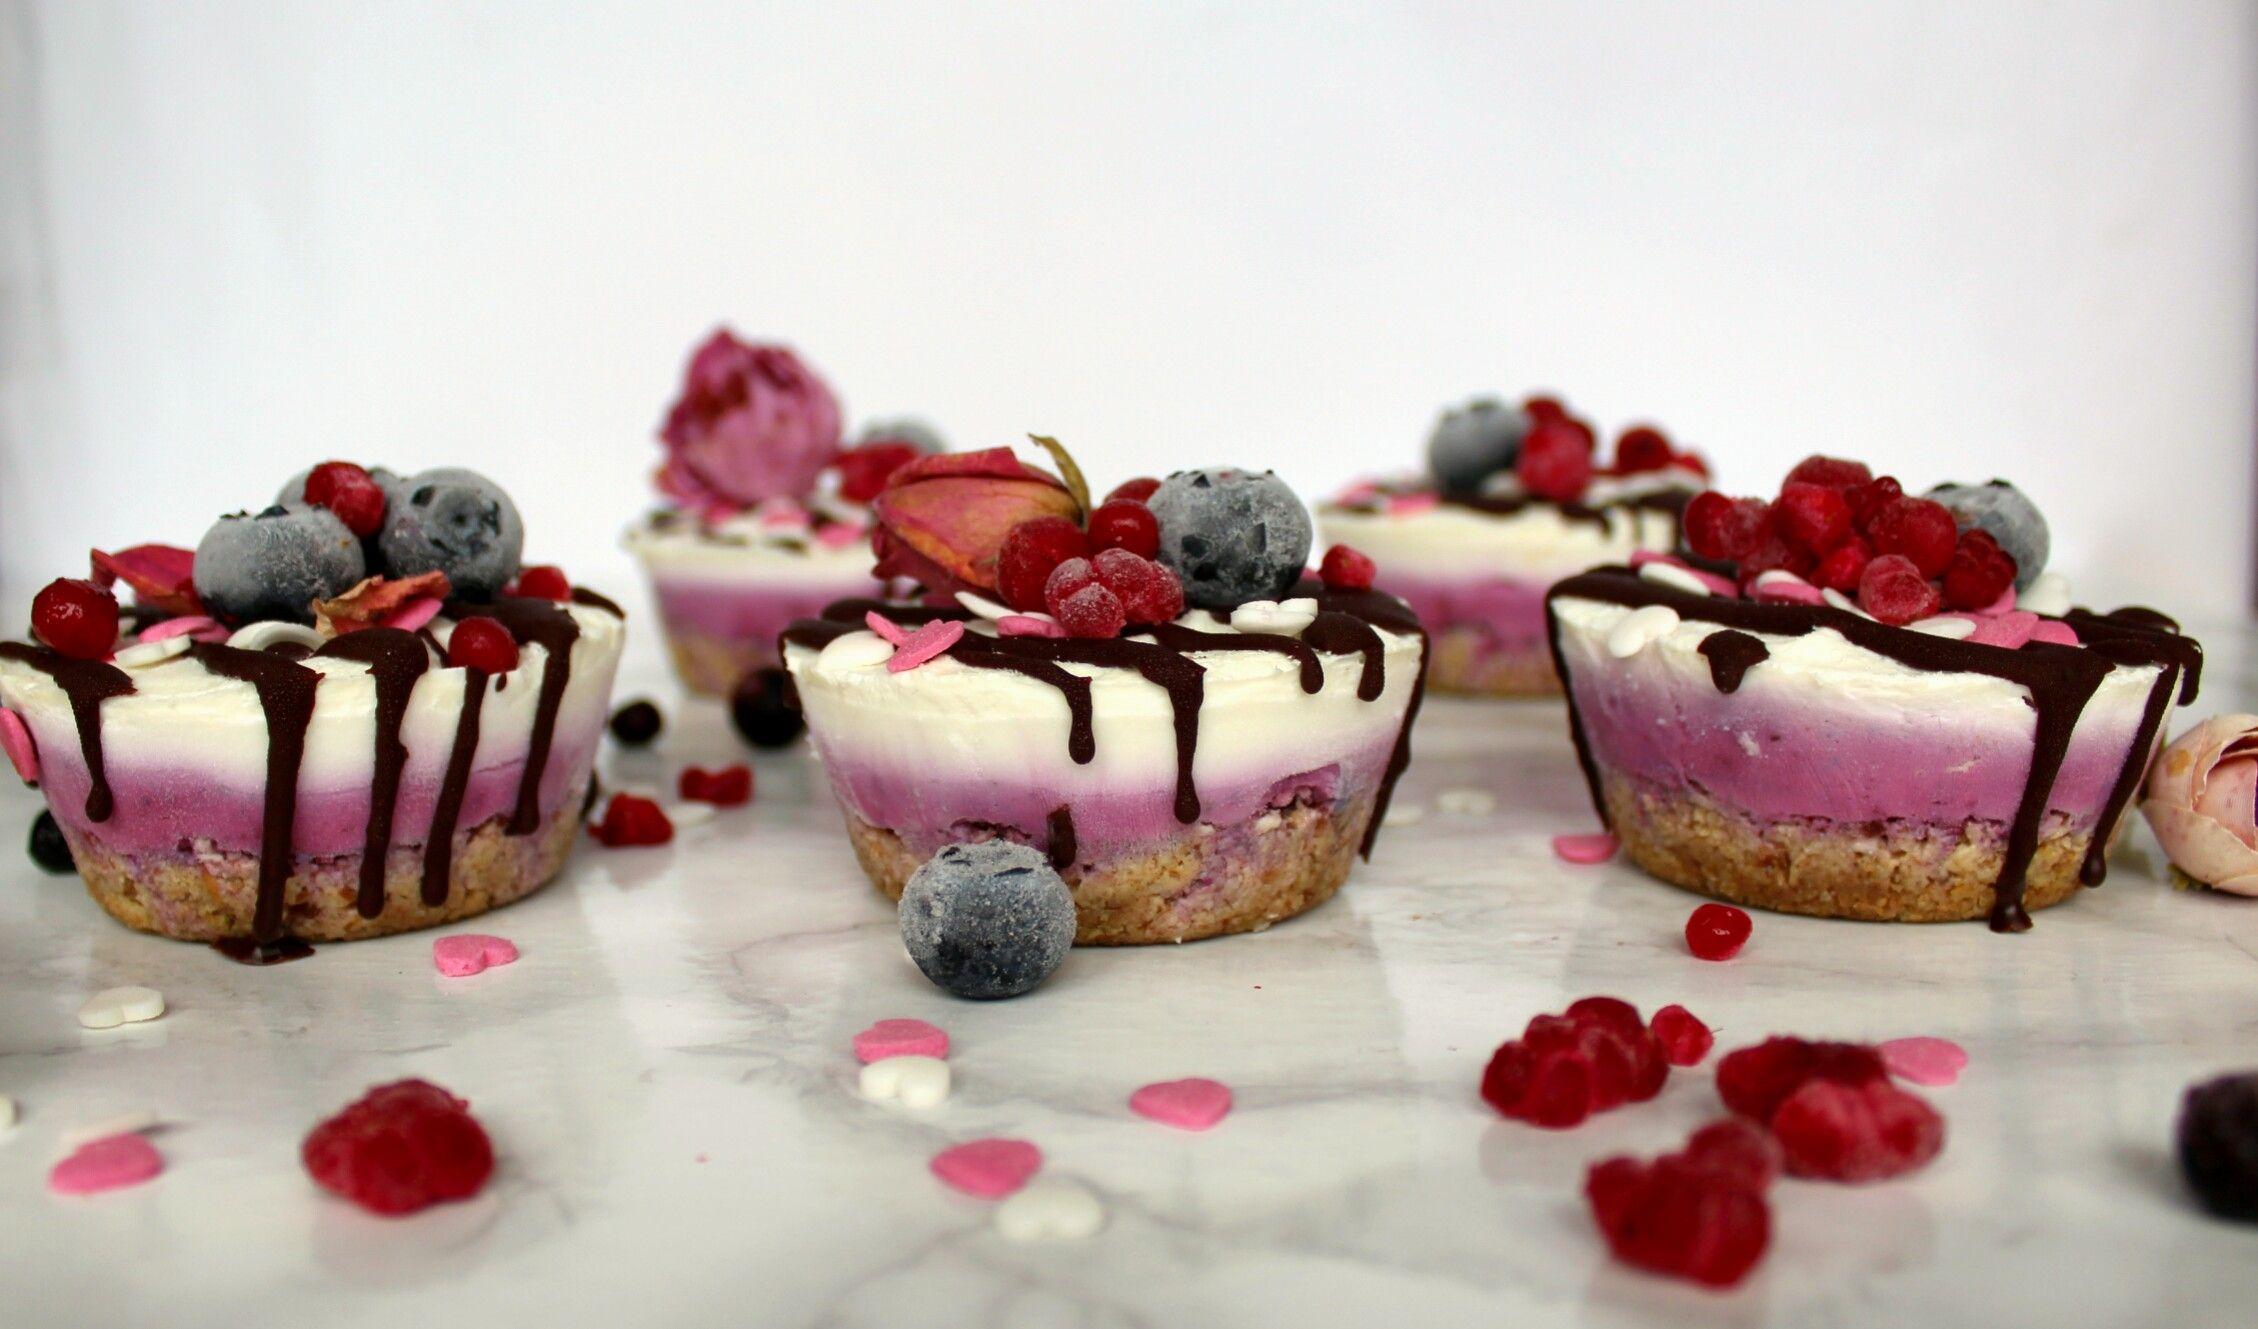 Recipe: Protein cheesecake cupcakes